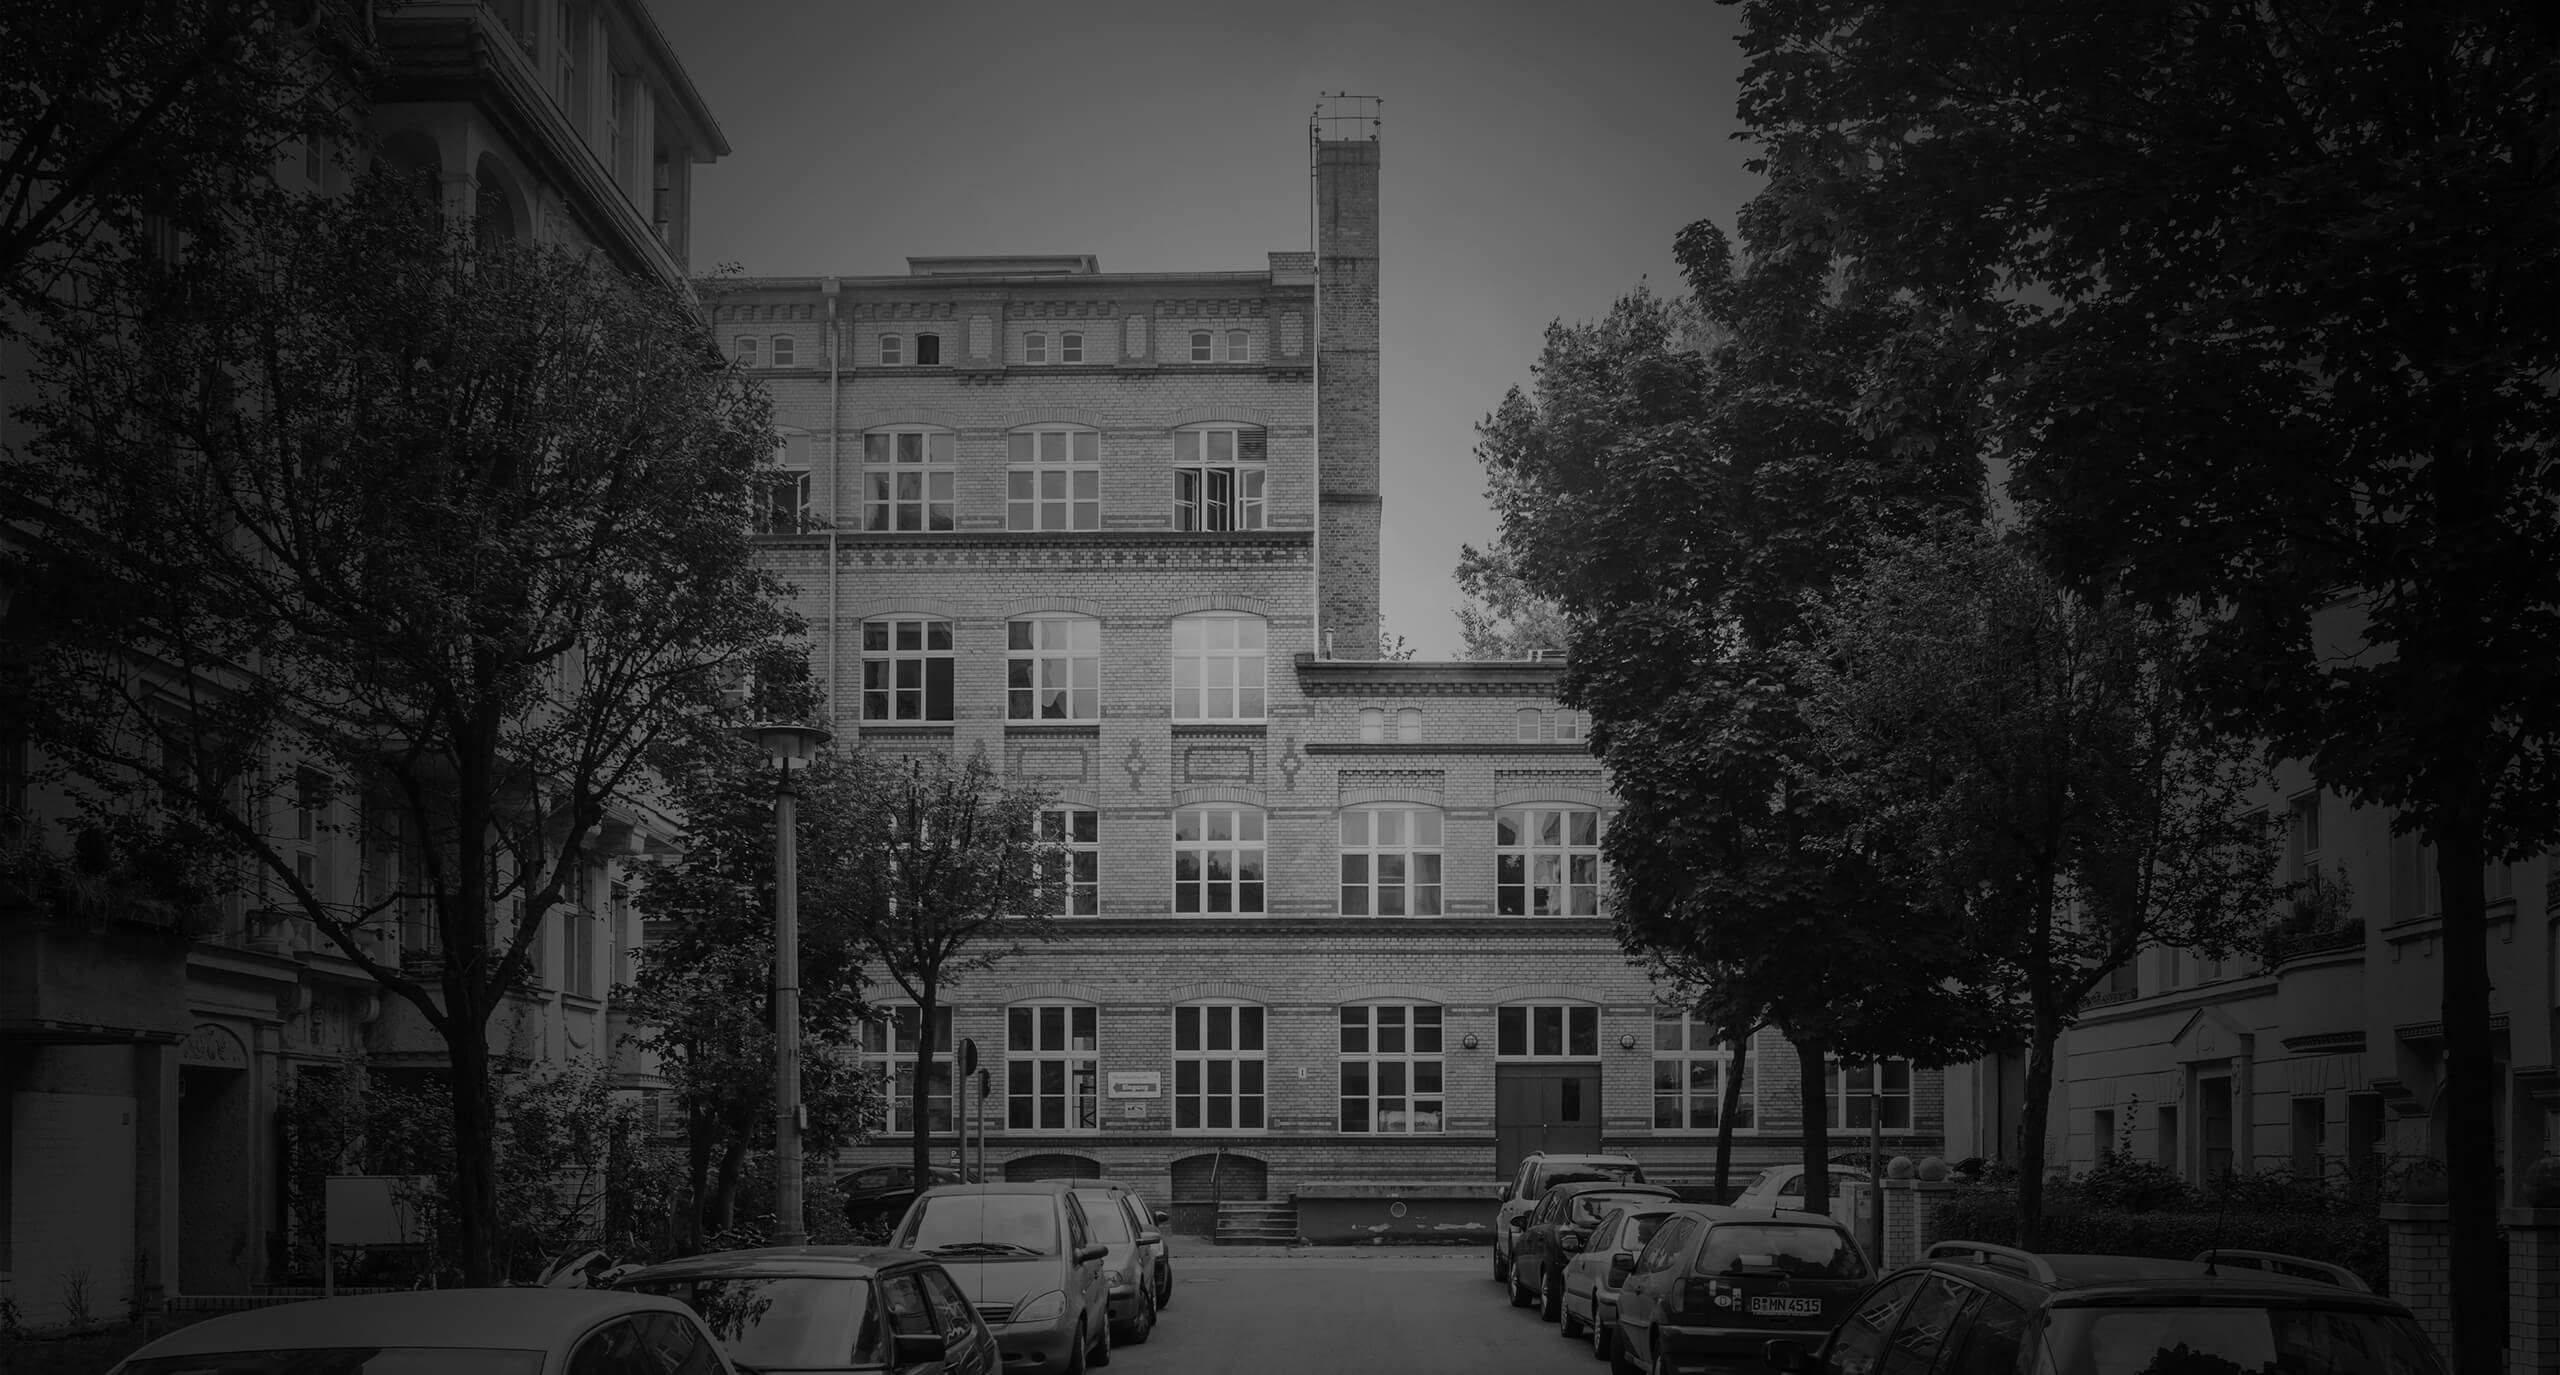 moosdorf_aufmacher